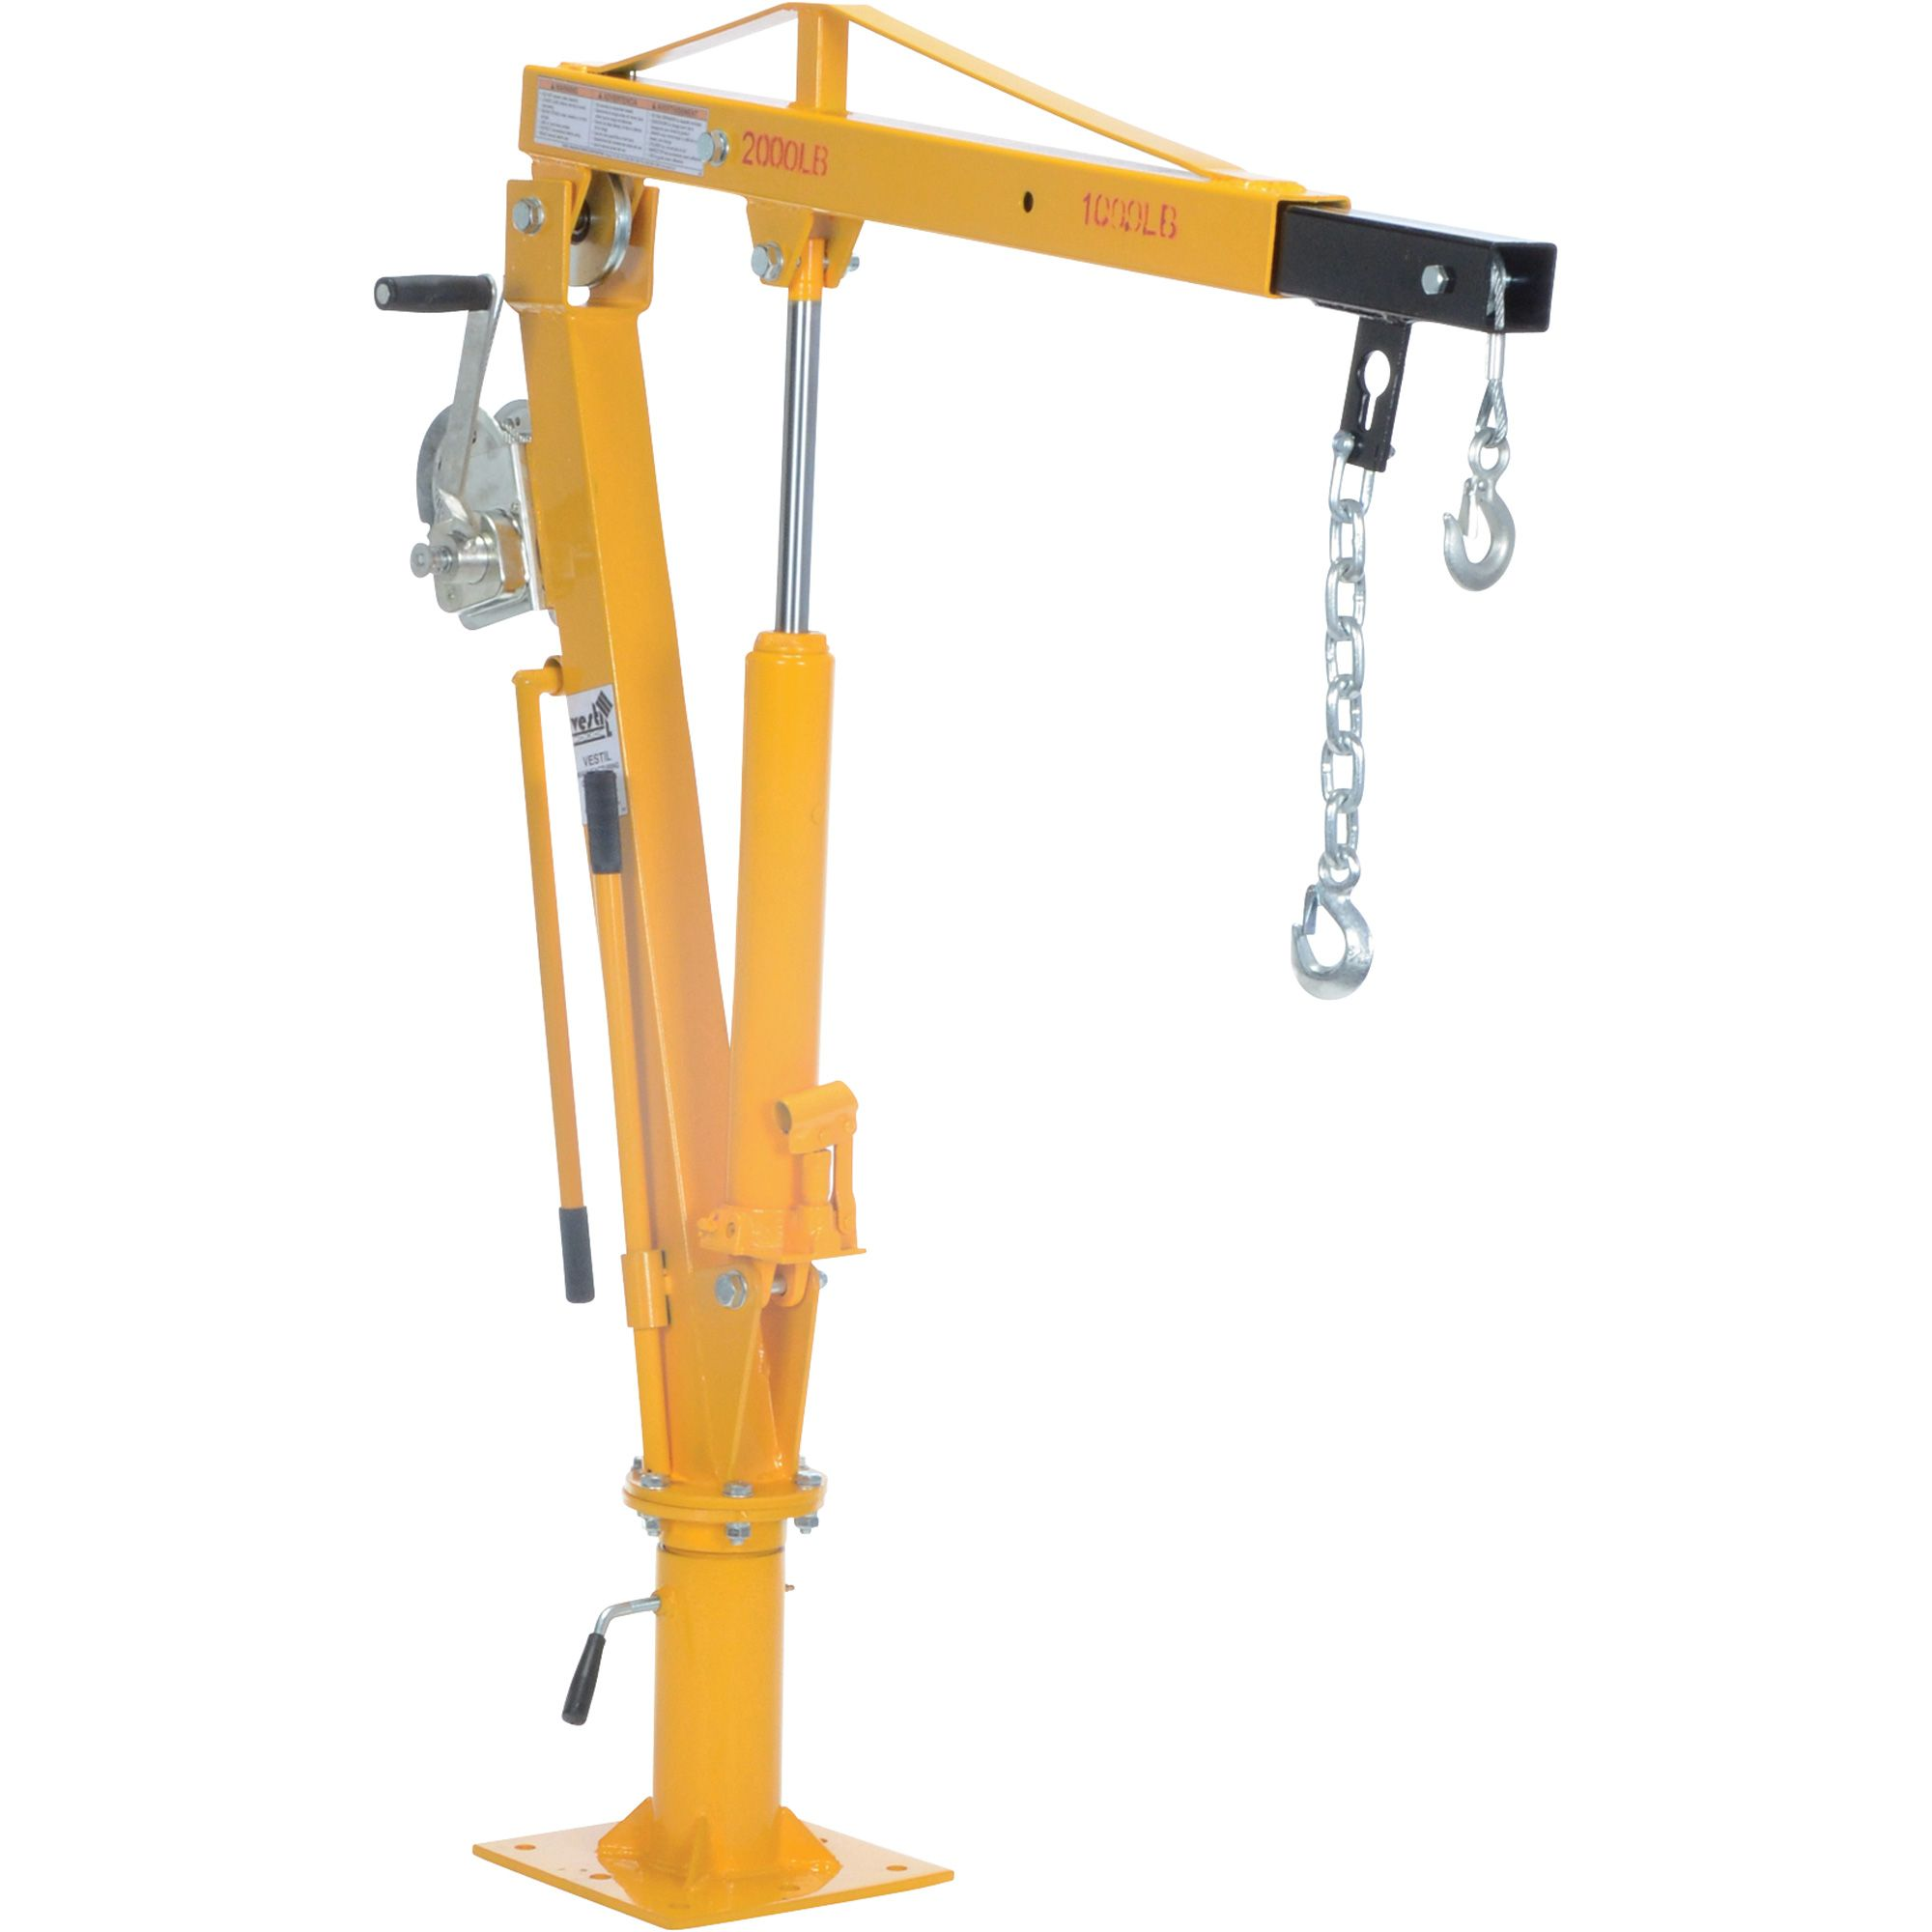 Vestil hydraulic pickup truck jib crane with hand winch 2 000 lb capacity model wtj 4